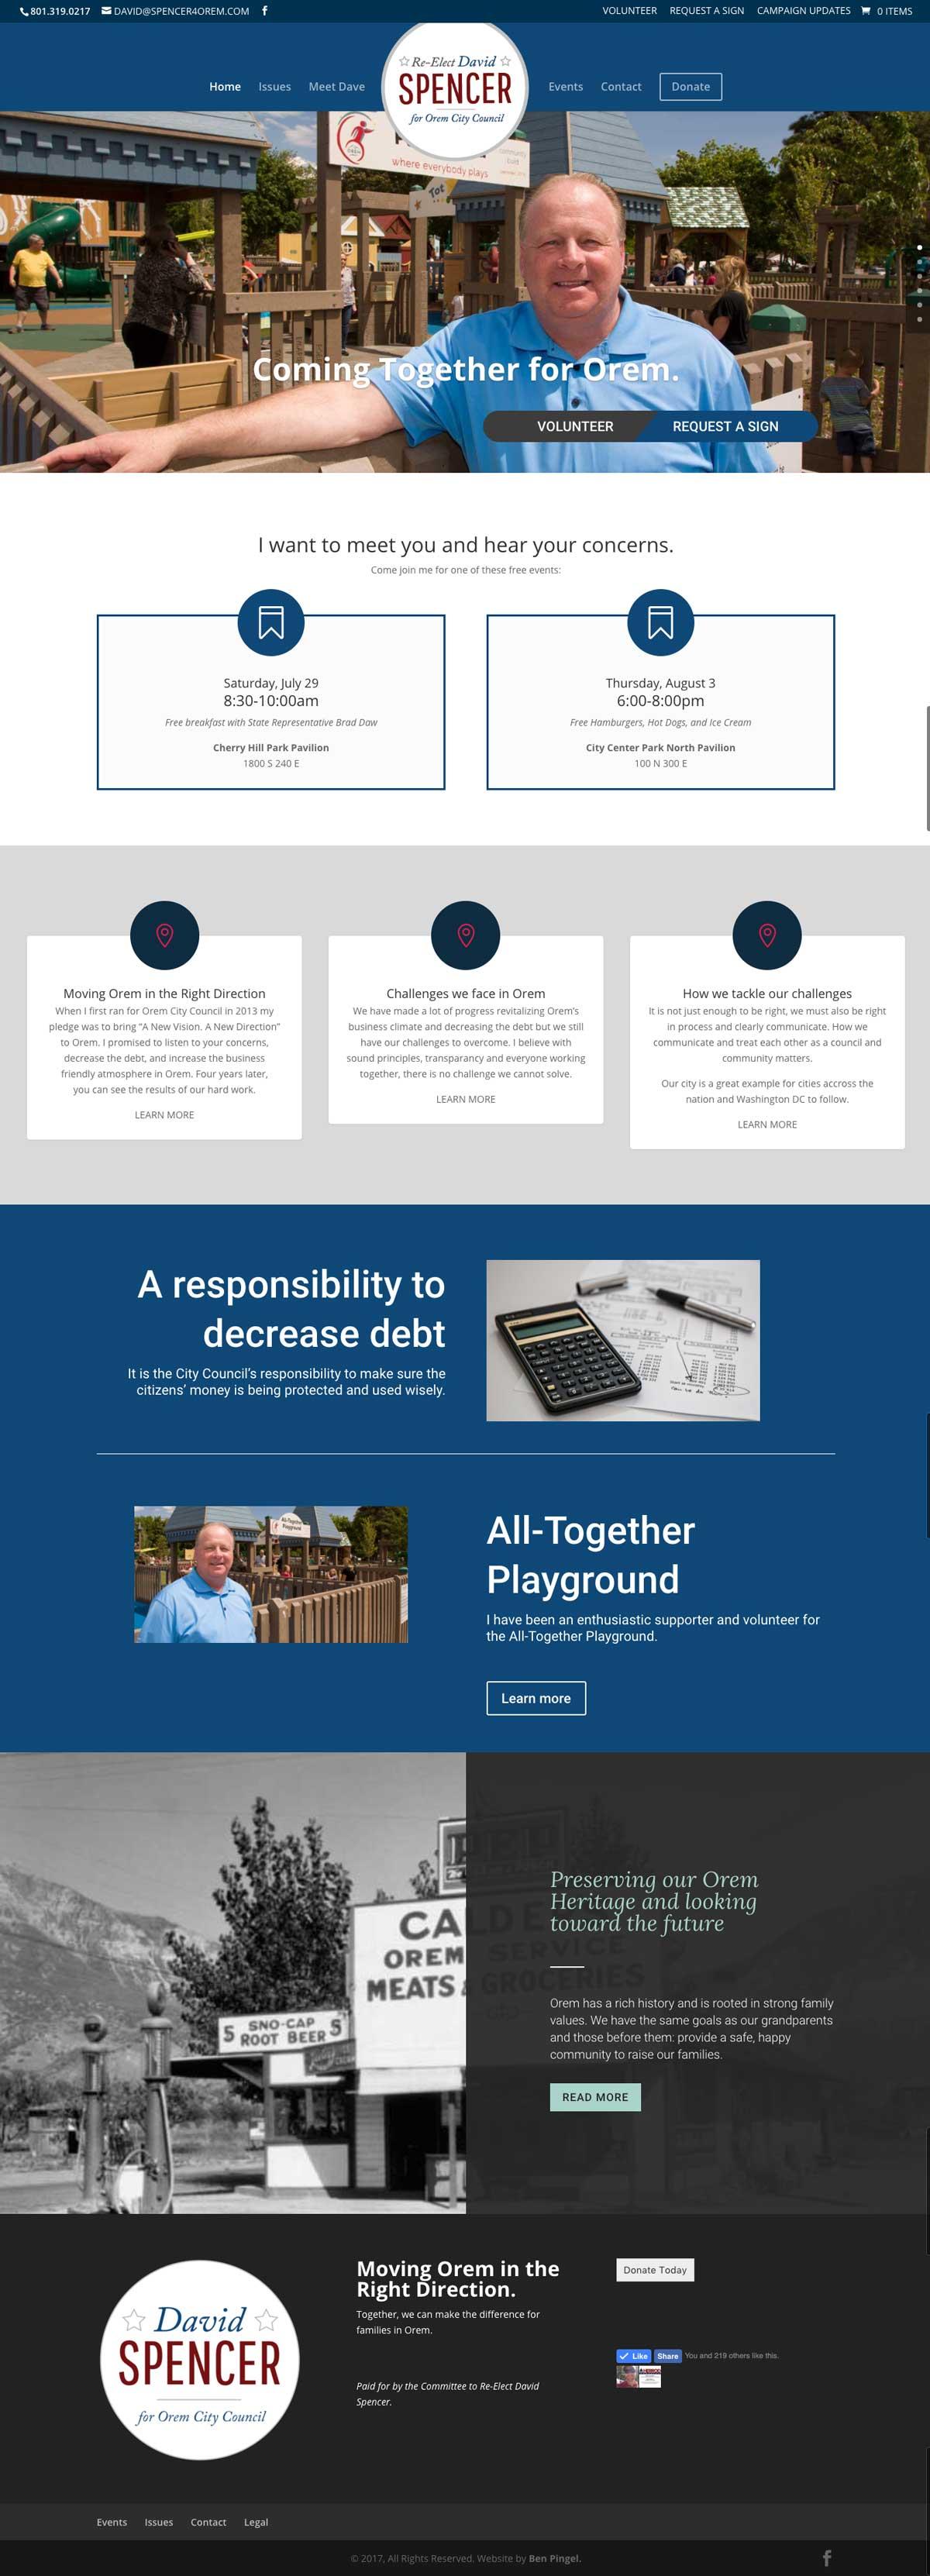 Best Responsive Government Website Templates 2017 Visualbrainsfo